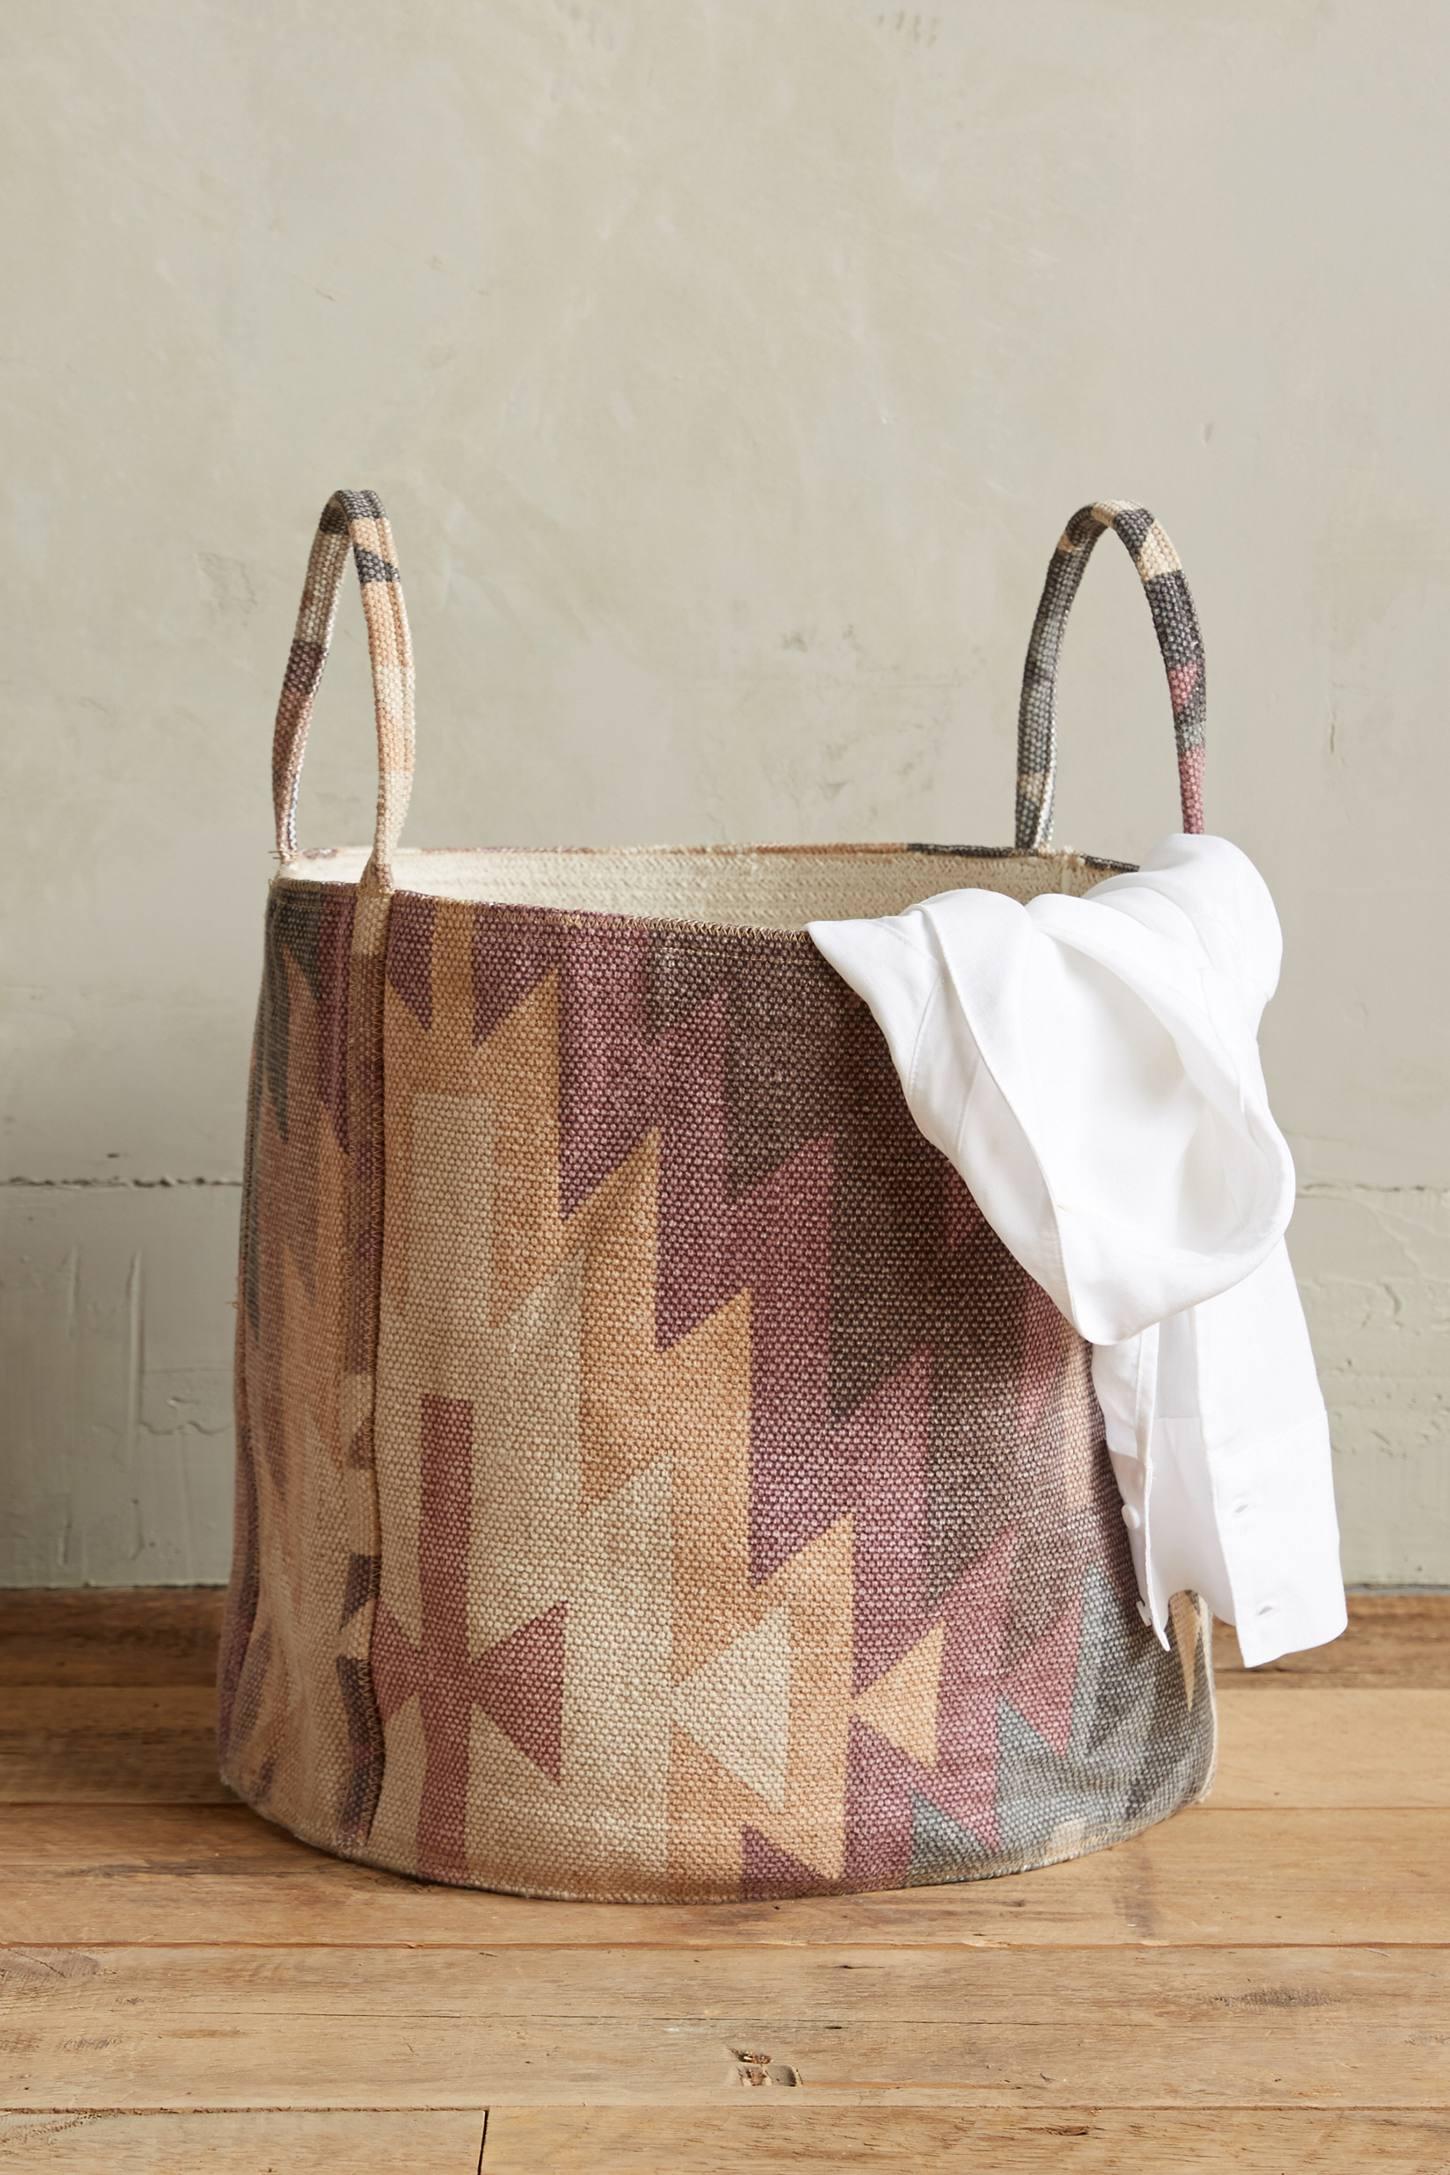 Patterned basket from Anthropologie